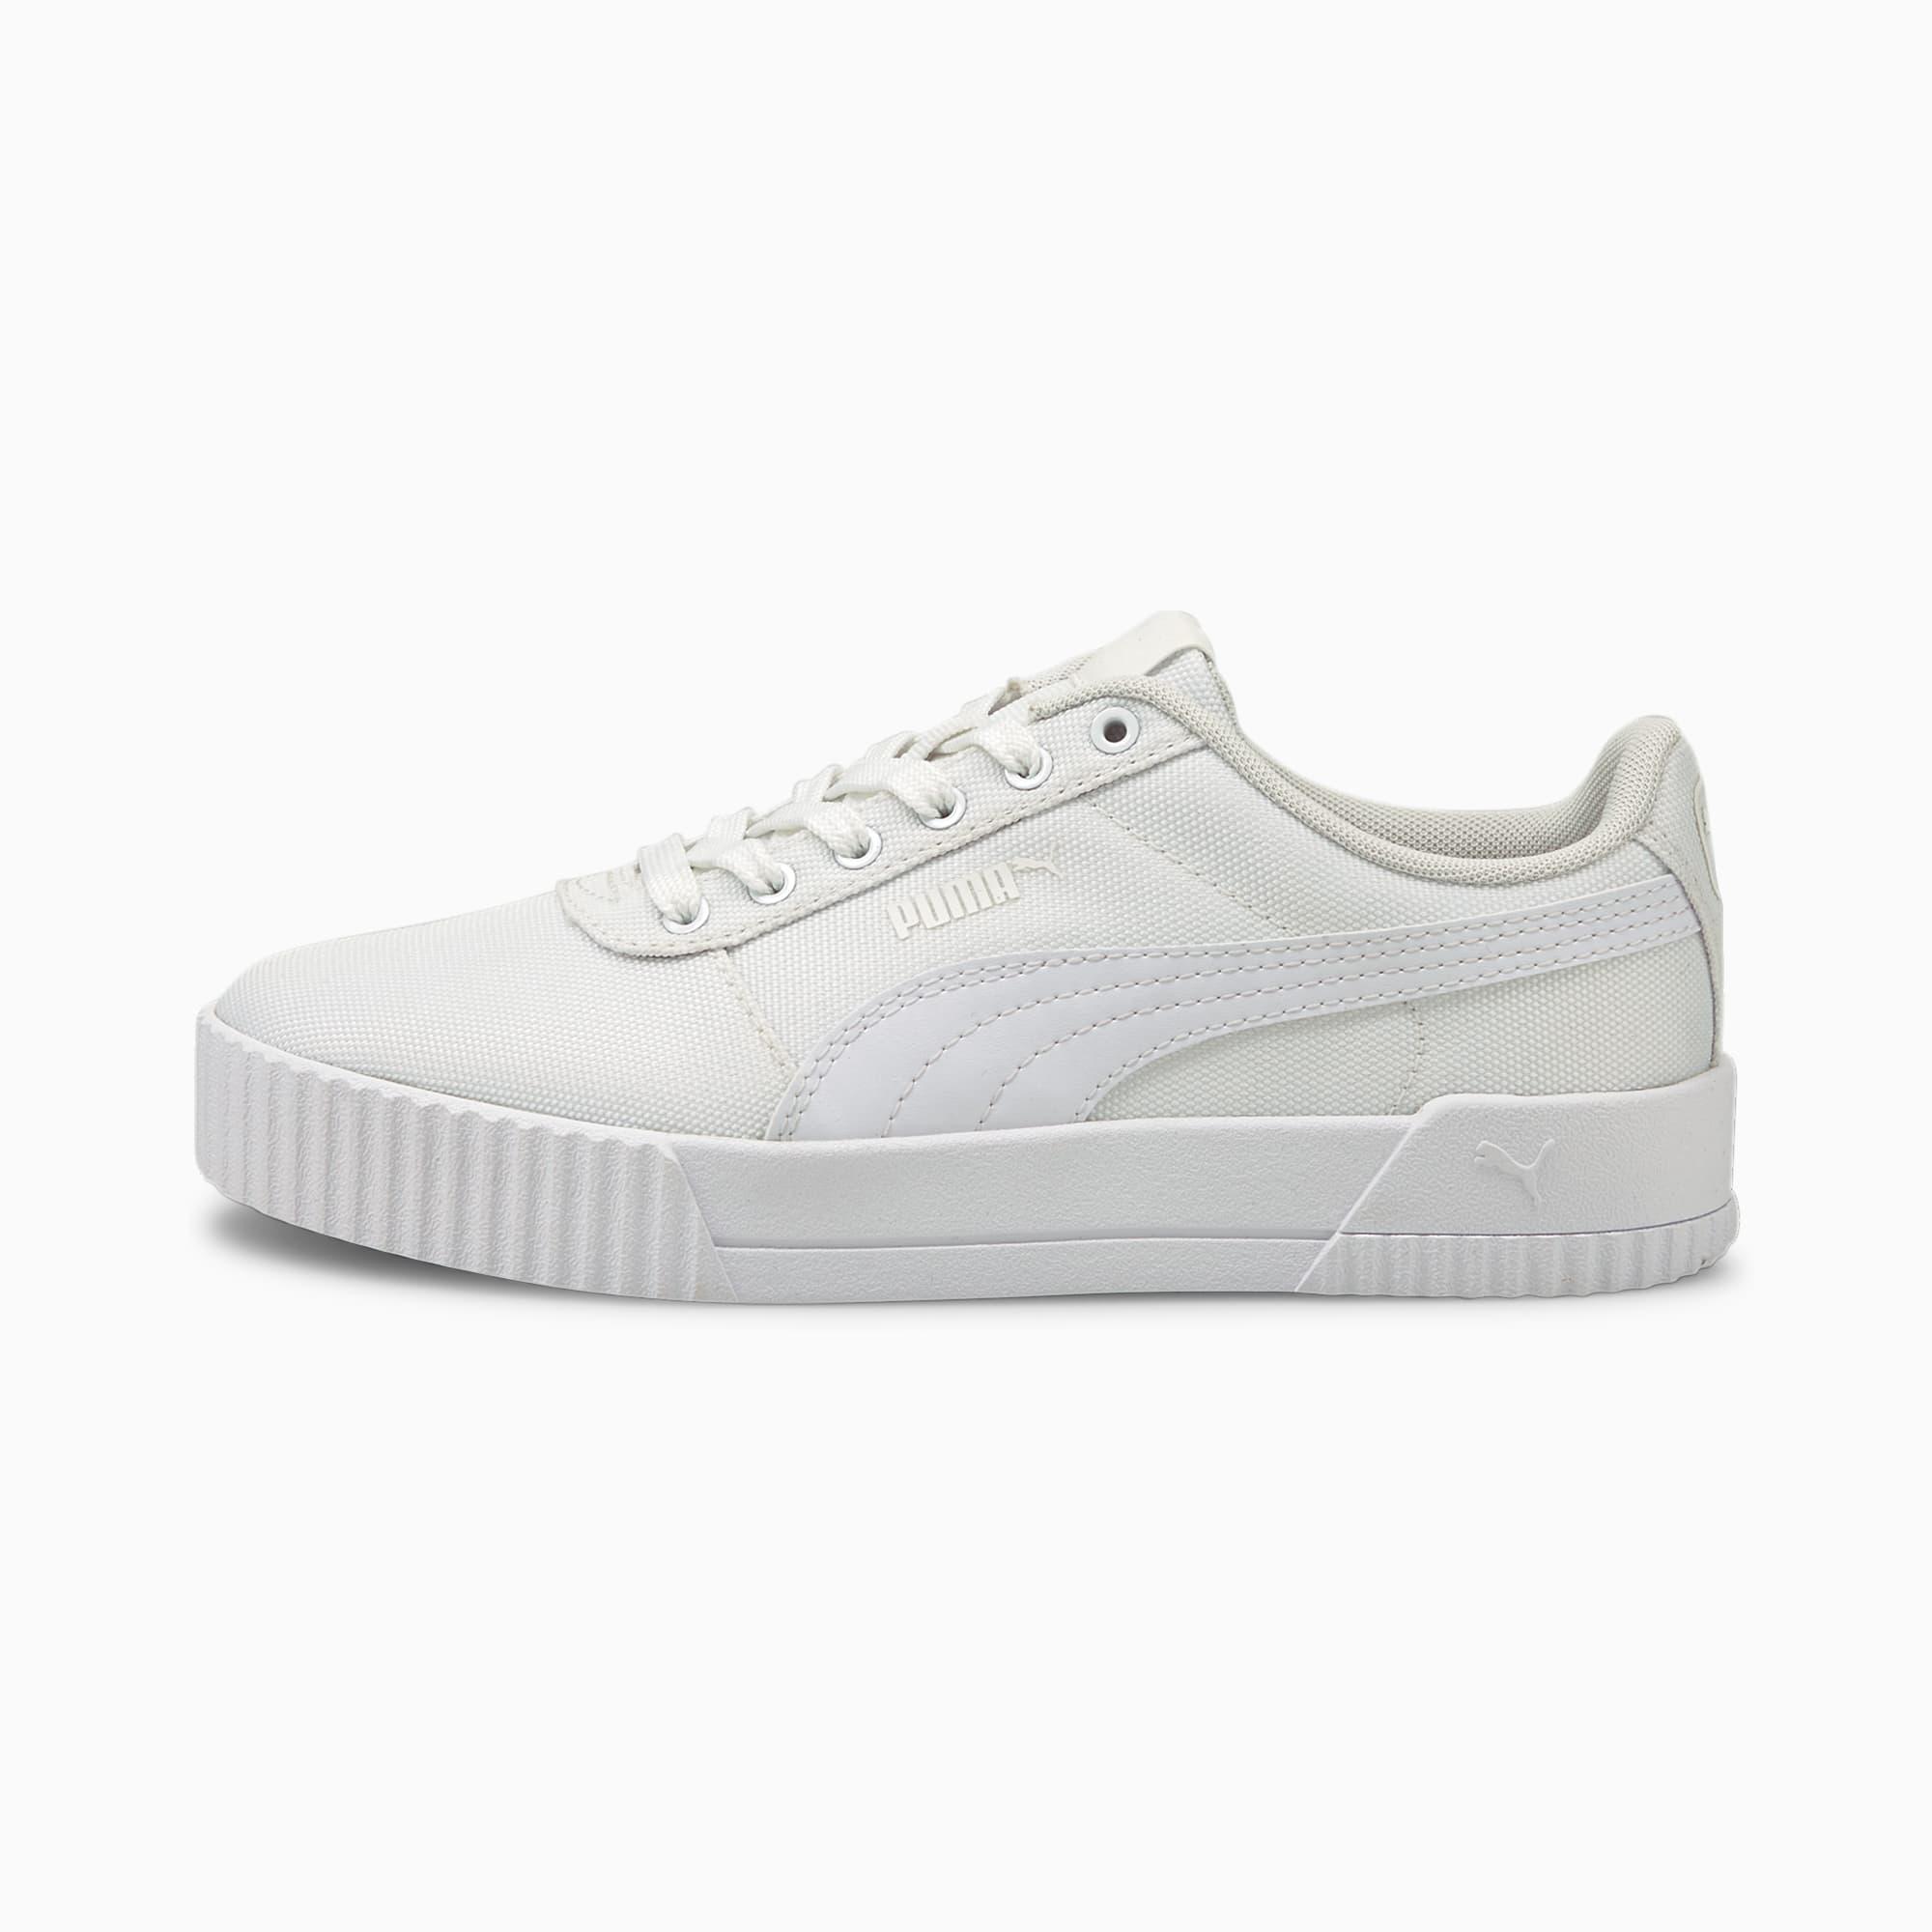 Chaussure Baskets montantes en toile Carina , Blanc, Taille 40, Chaussures - PUMA - Modalova